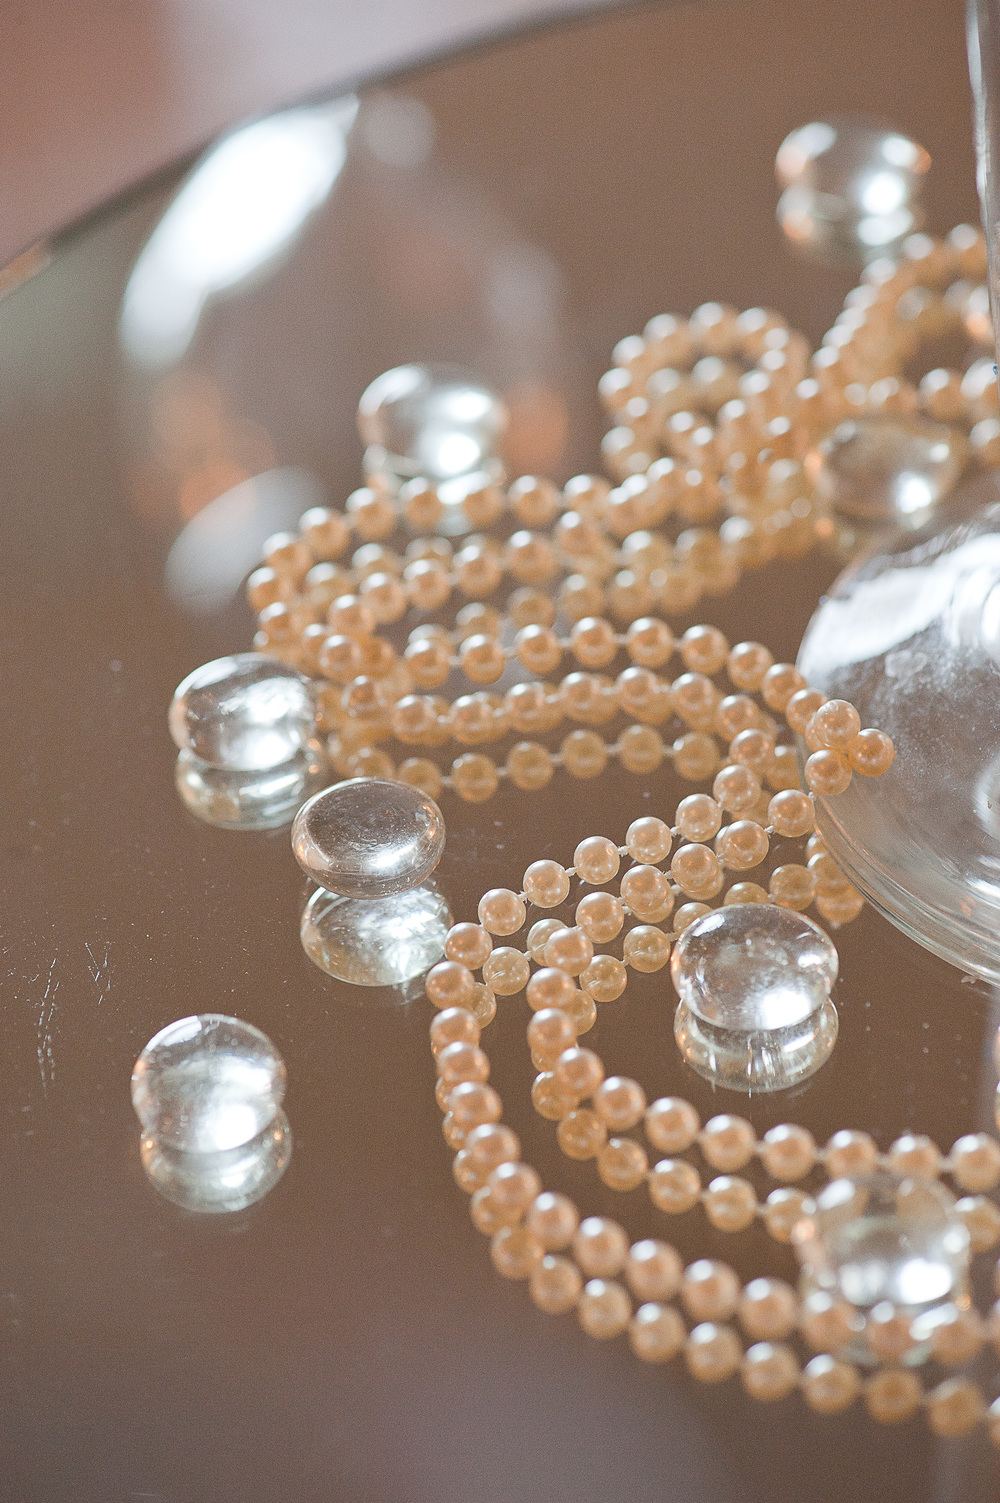 Pearls - close up.jpg